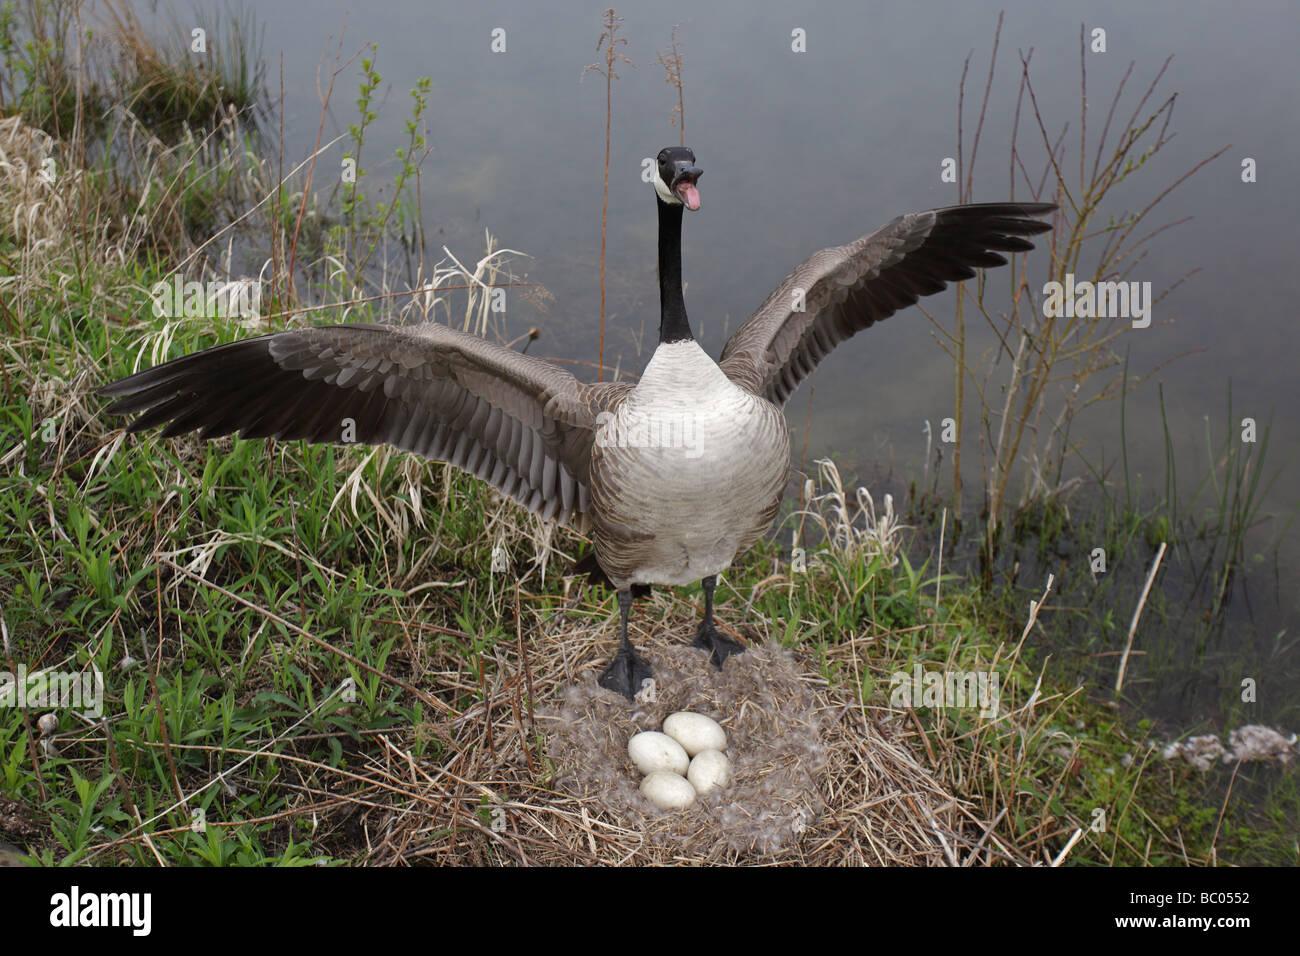 Canada Goose kensington parka outlet fake - Canada Goose (branta Canadensis) Mother Protecting Eggs On Nest ...